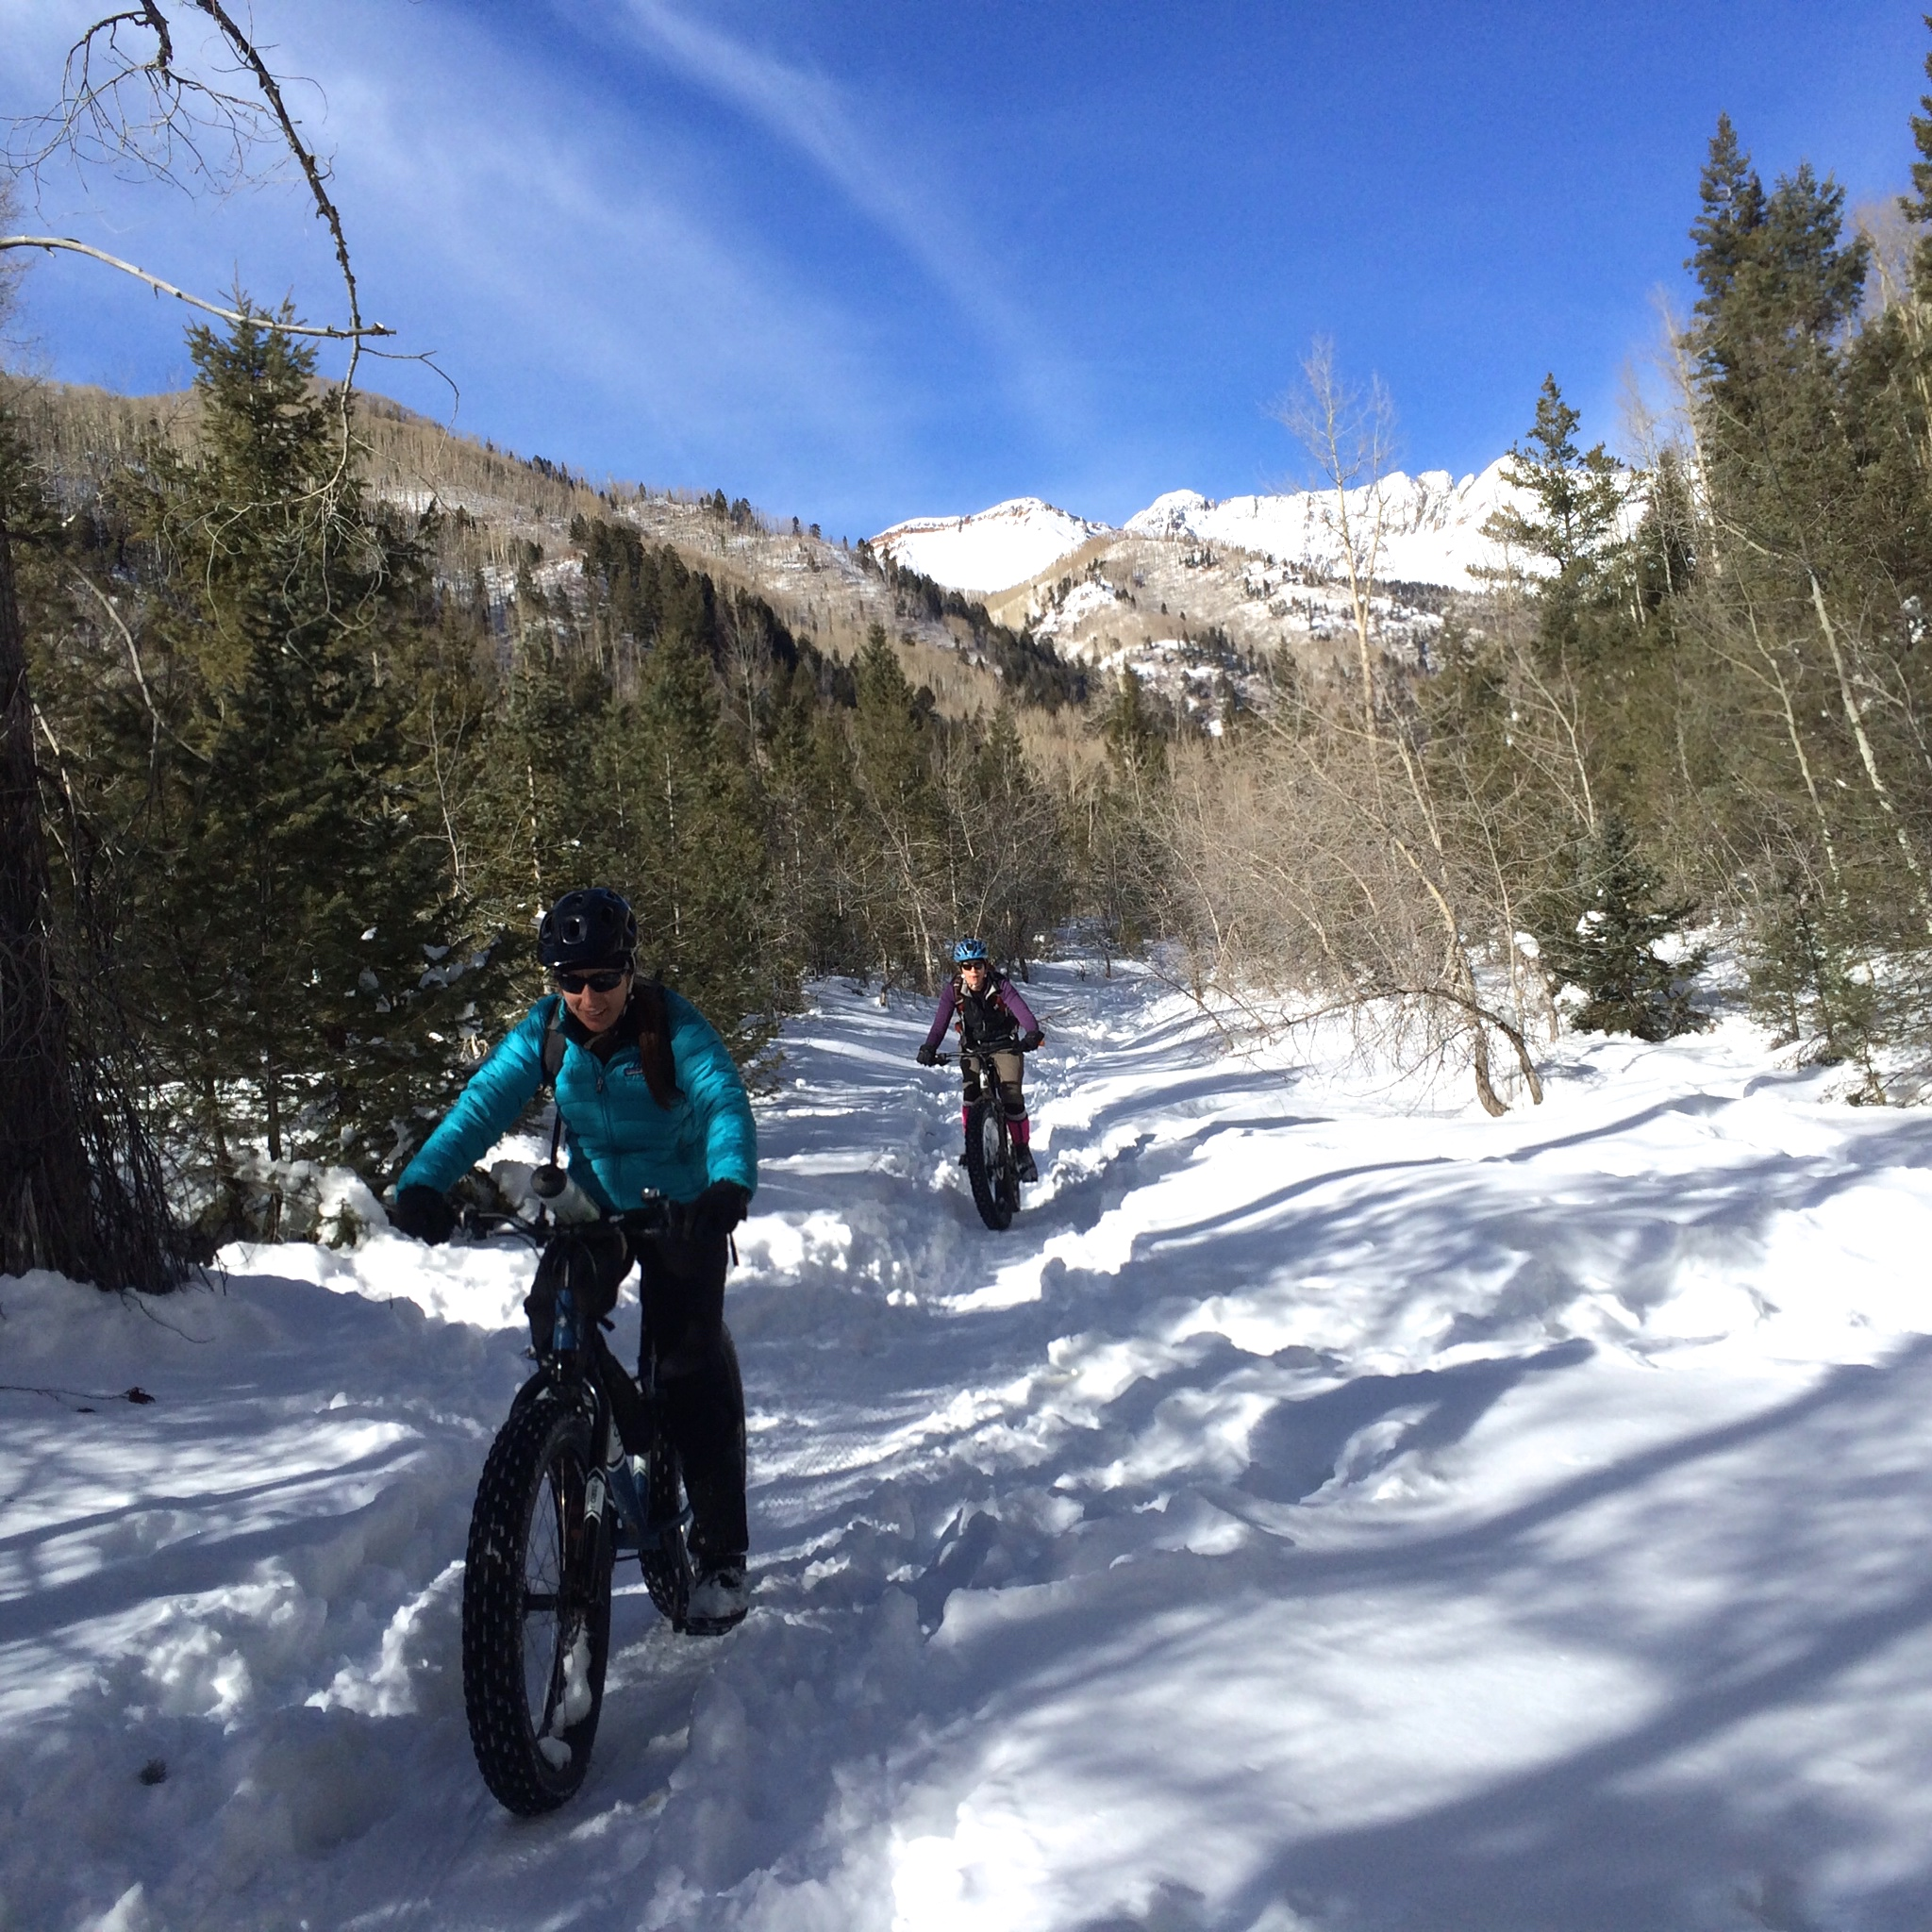 Snow bikers of all abilities enjoy La Plata Canyon's frozen goodness.